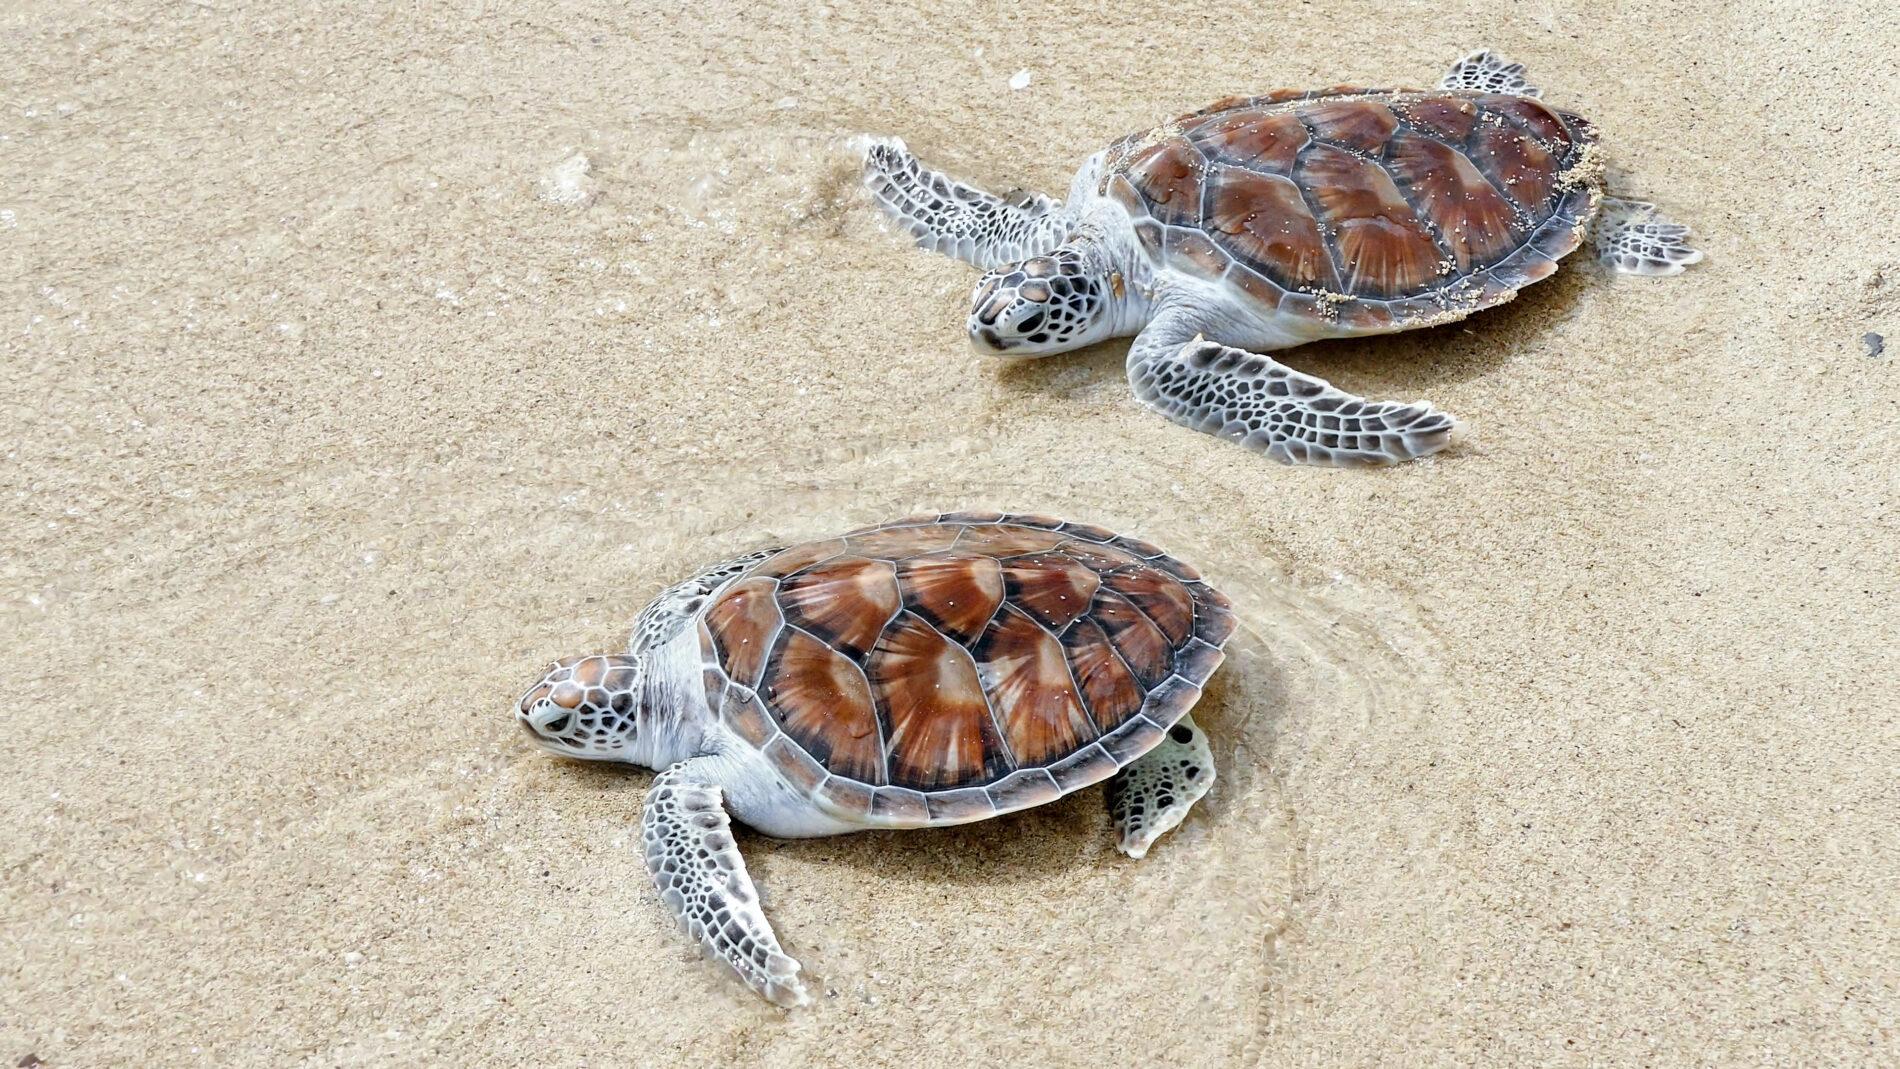 Baby sea turtles on the beach in Phuket, Thailand